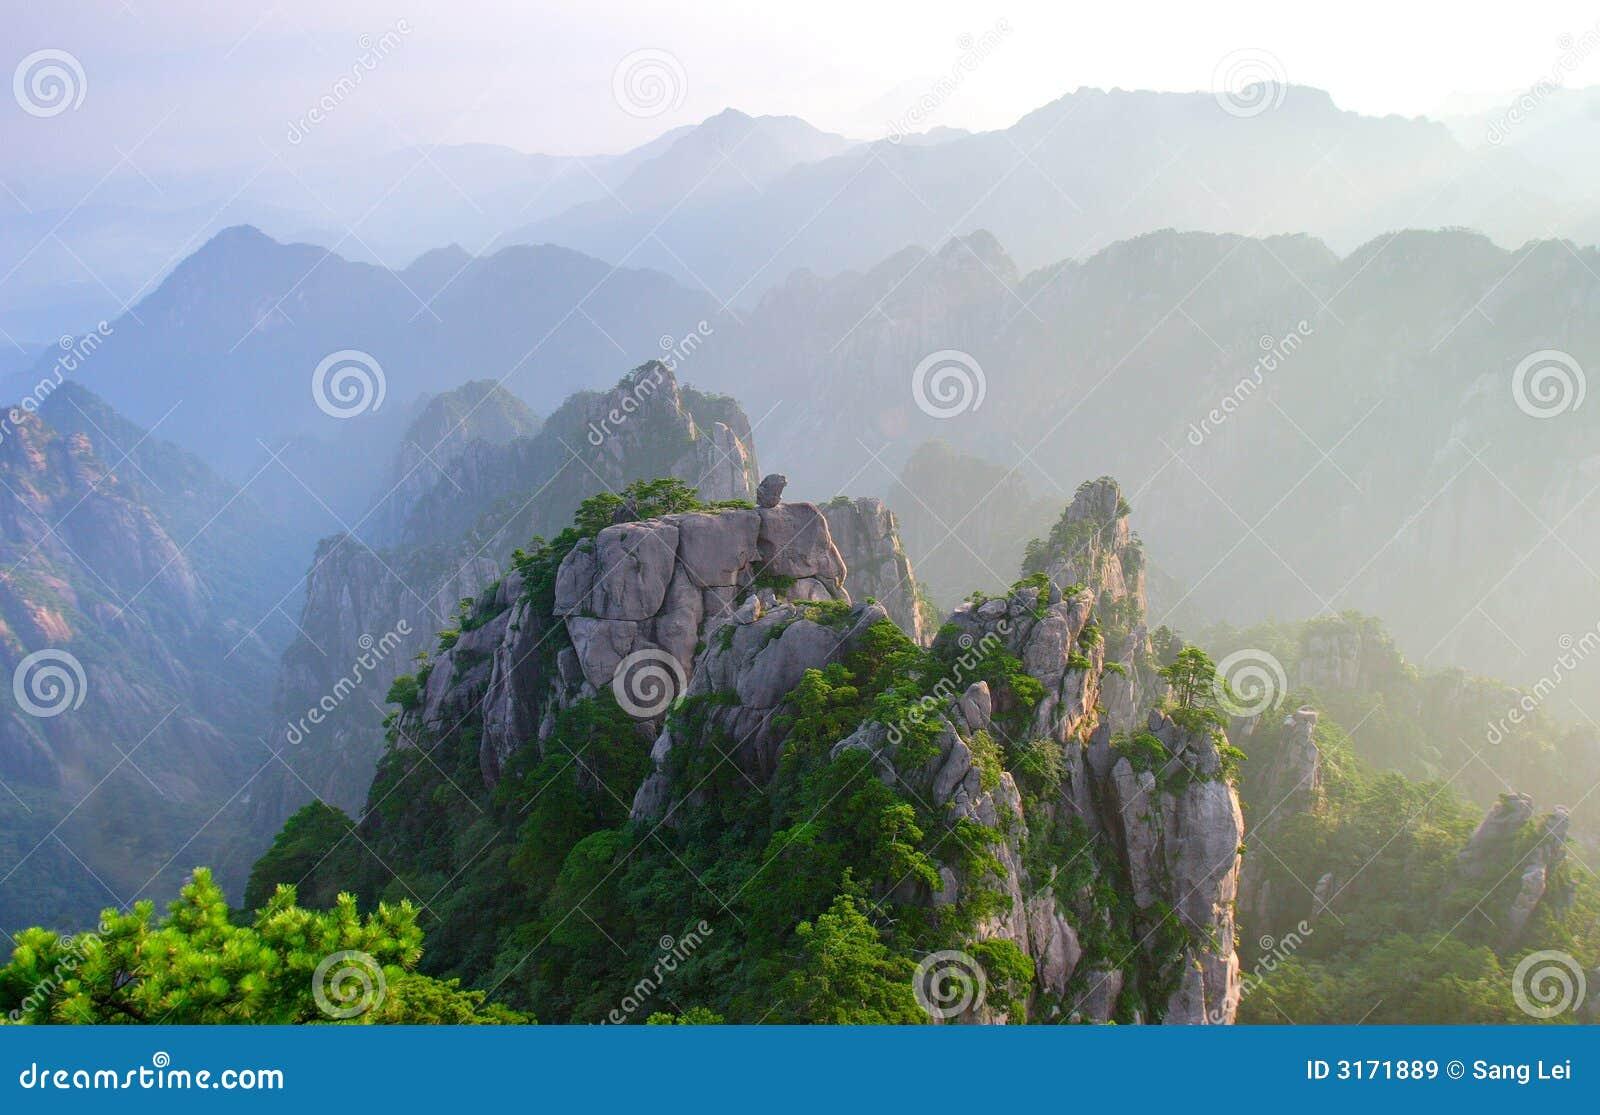 mount hangshan sunrise